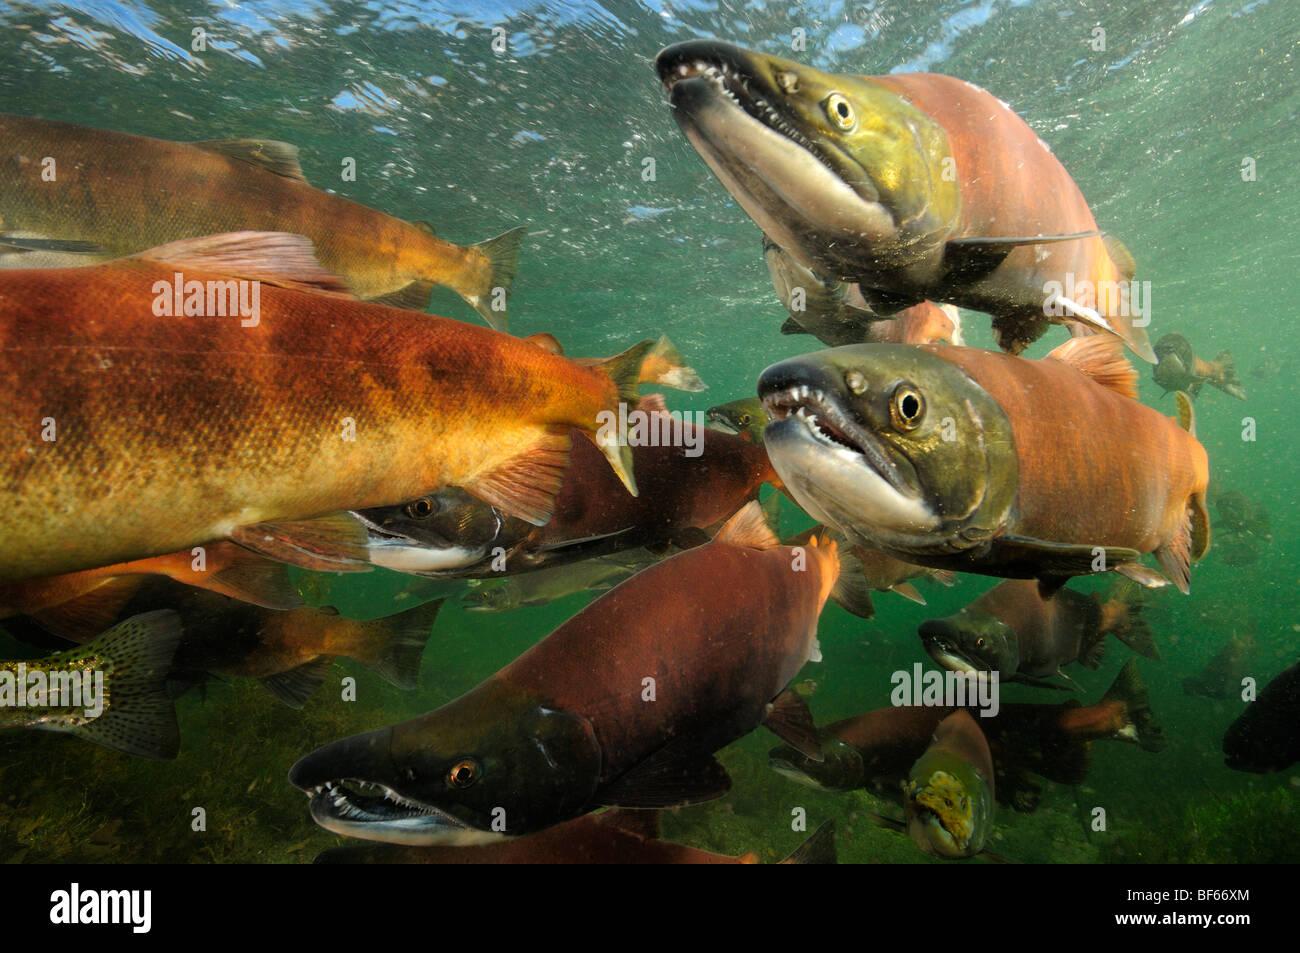 Le saumon rouge, Oncorhynchus nerka, Kokanee, East River, Colorado Photo Stock